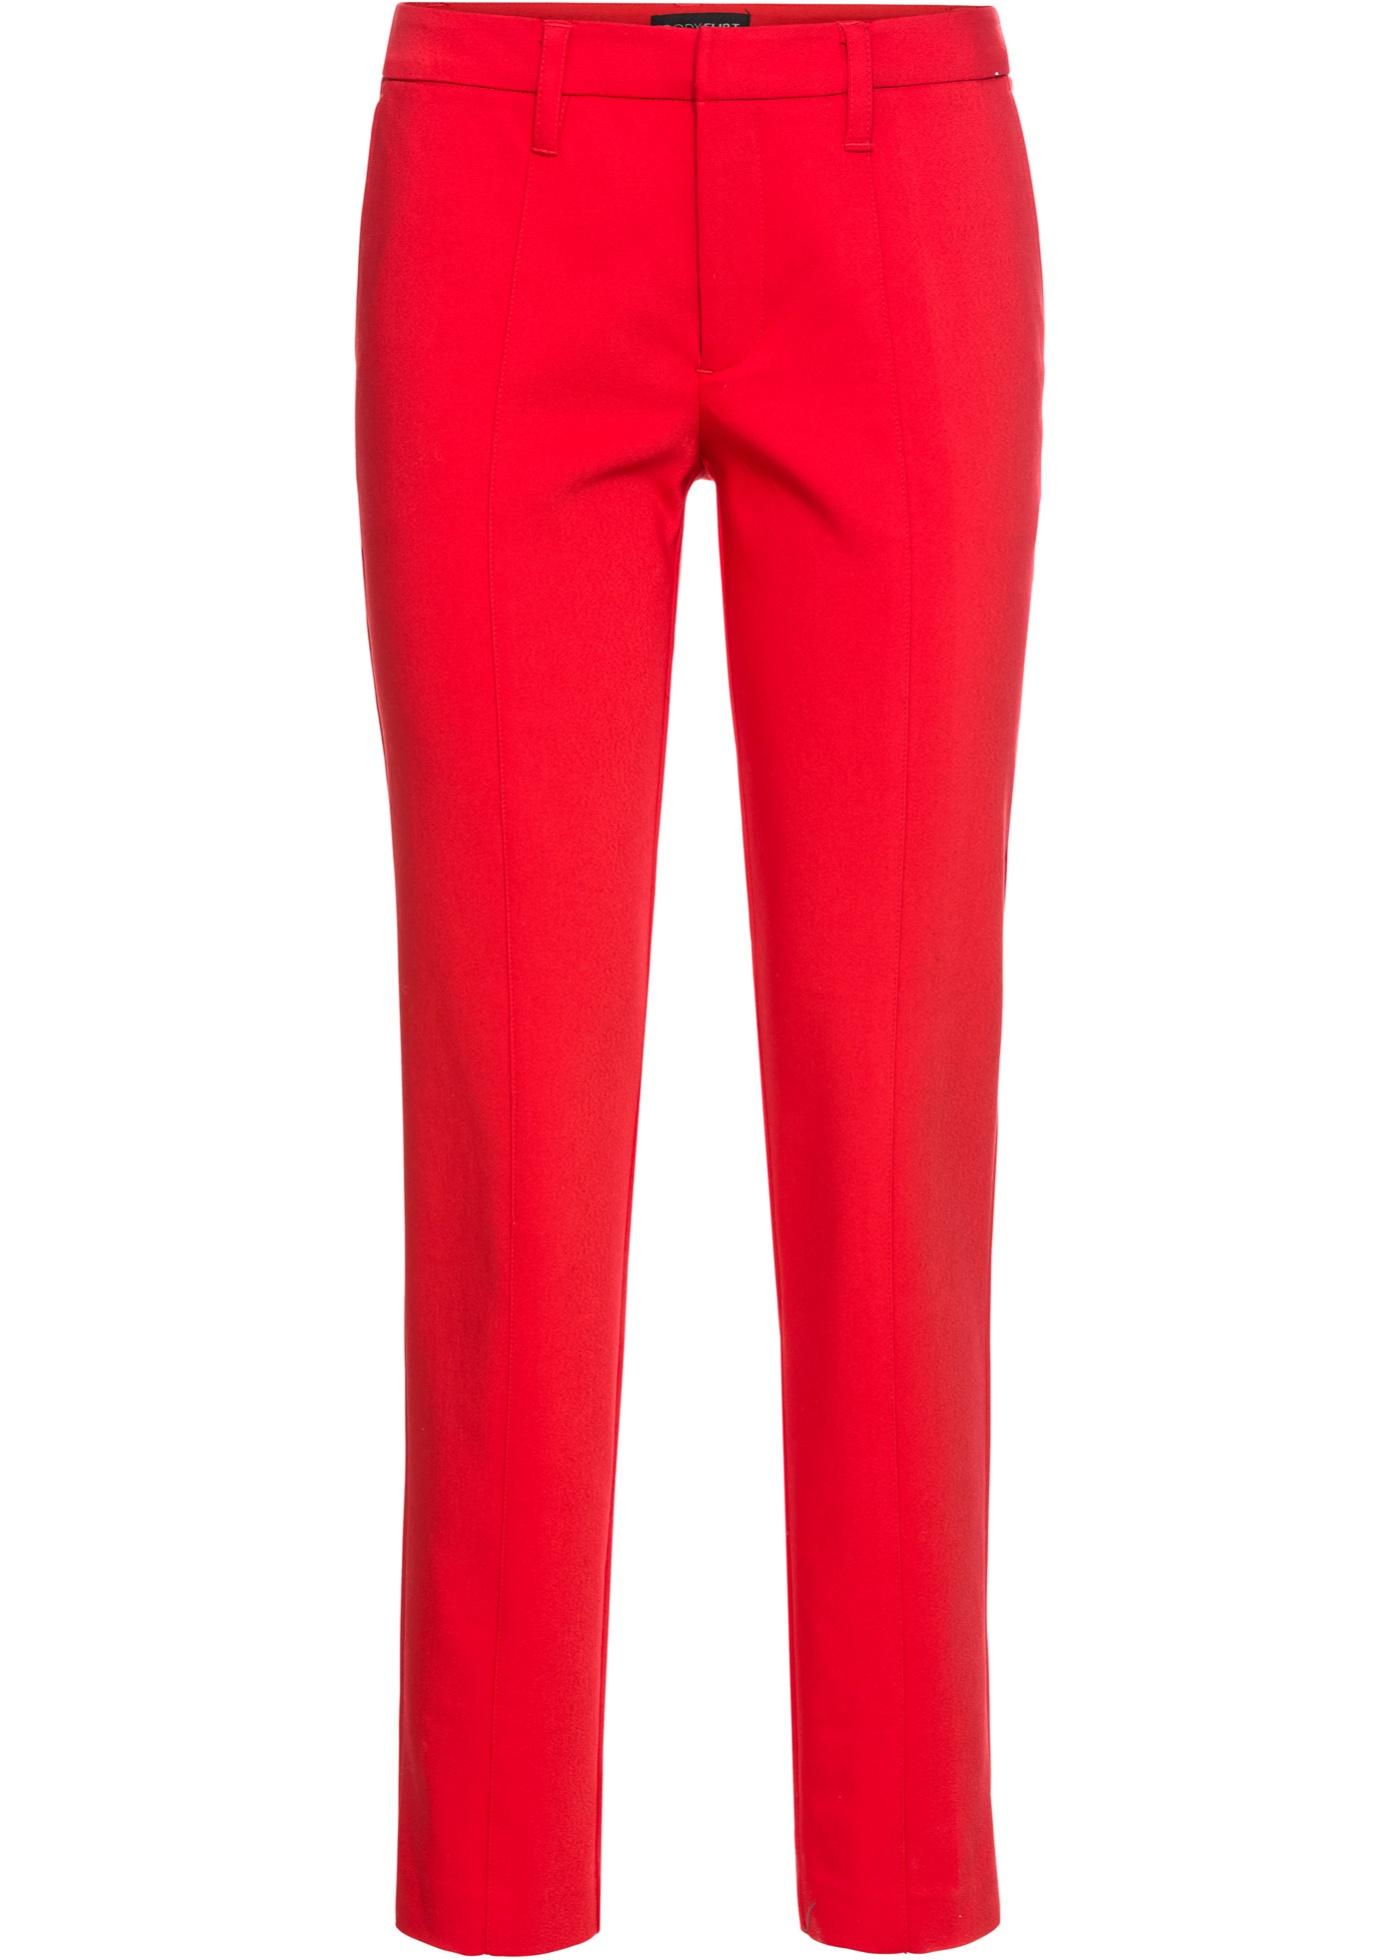 Pantalon Business avec fente ? la base